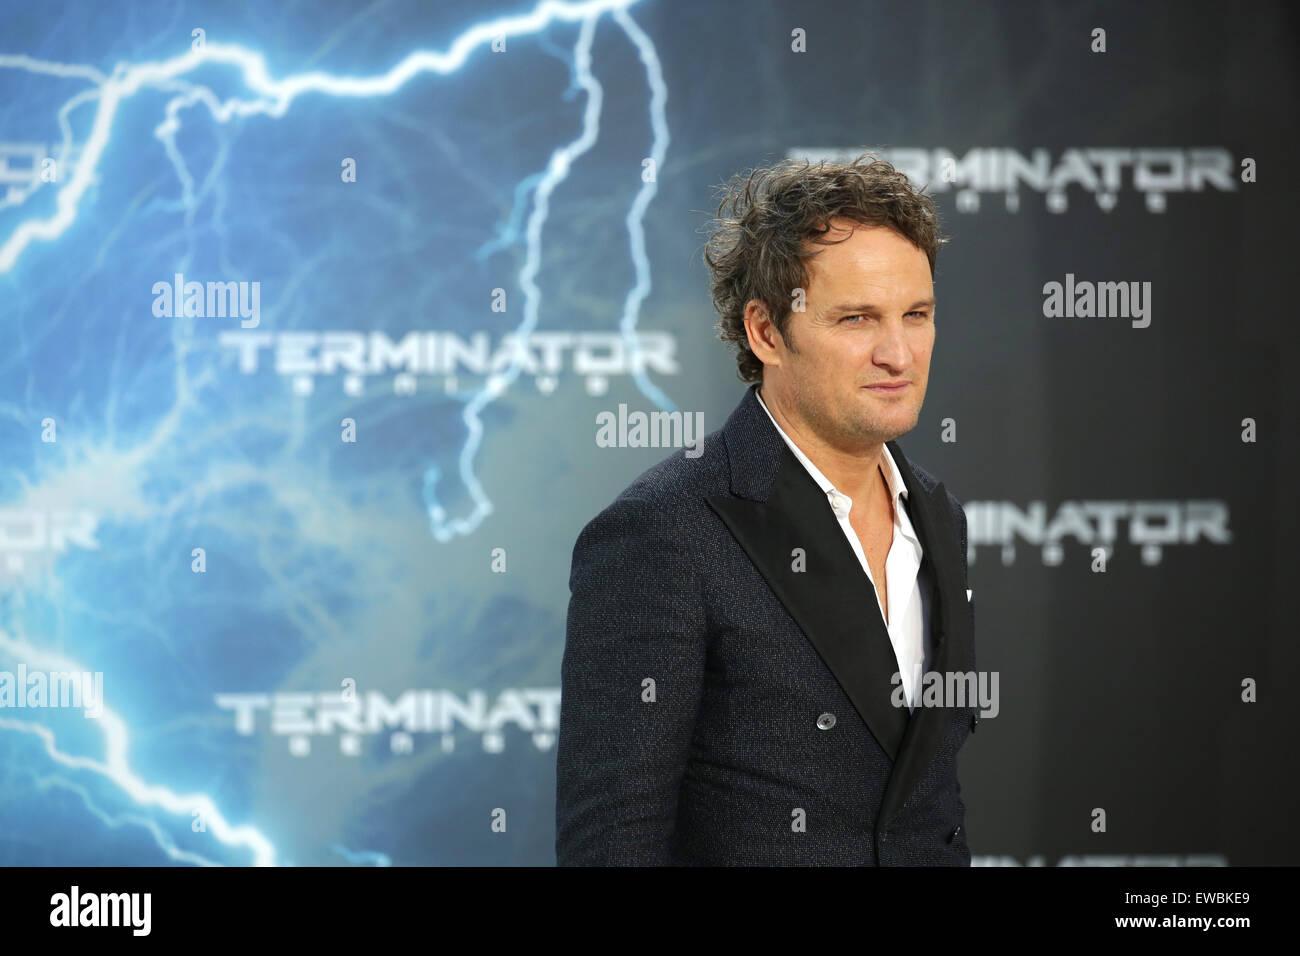 Berlin, Germany. 21st June, 2015. Actor Jason Clarke arrives to the European premiere of the film 'Terminator Genisys' in Berlin, Germany, 21 June 2015. Photo: Joerg Carstensen/dpa/Alamy Live News Stock Photo